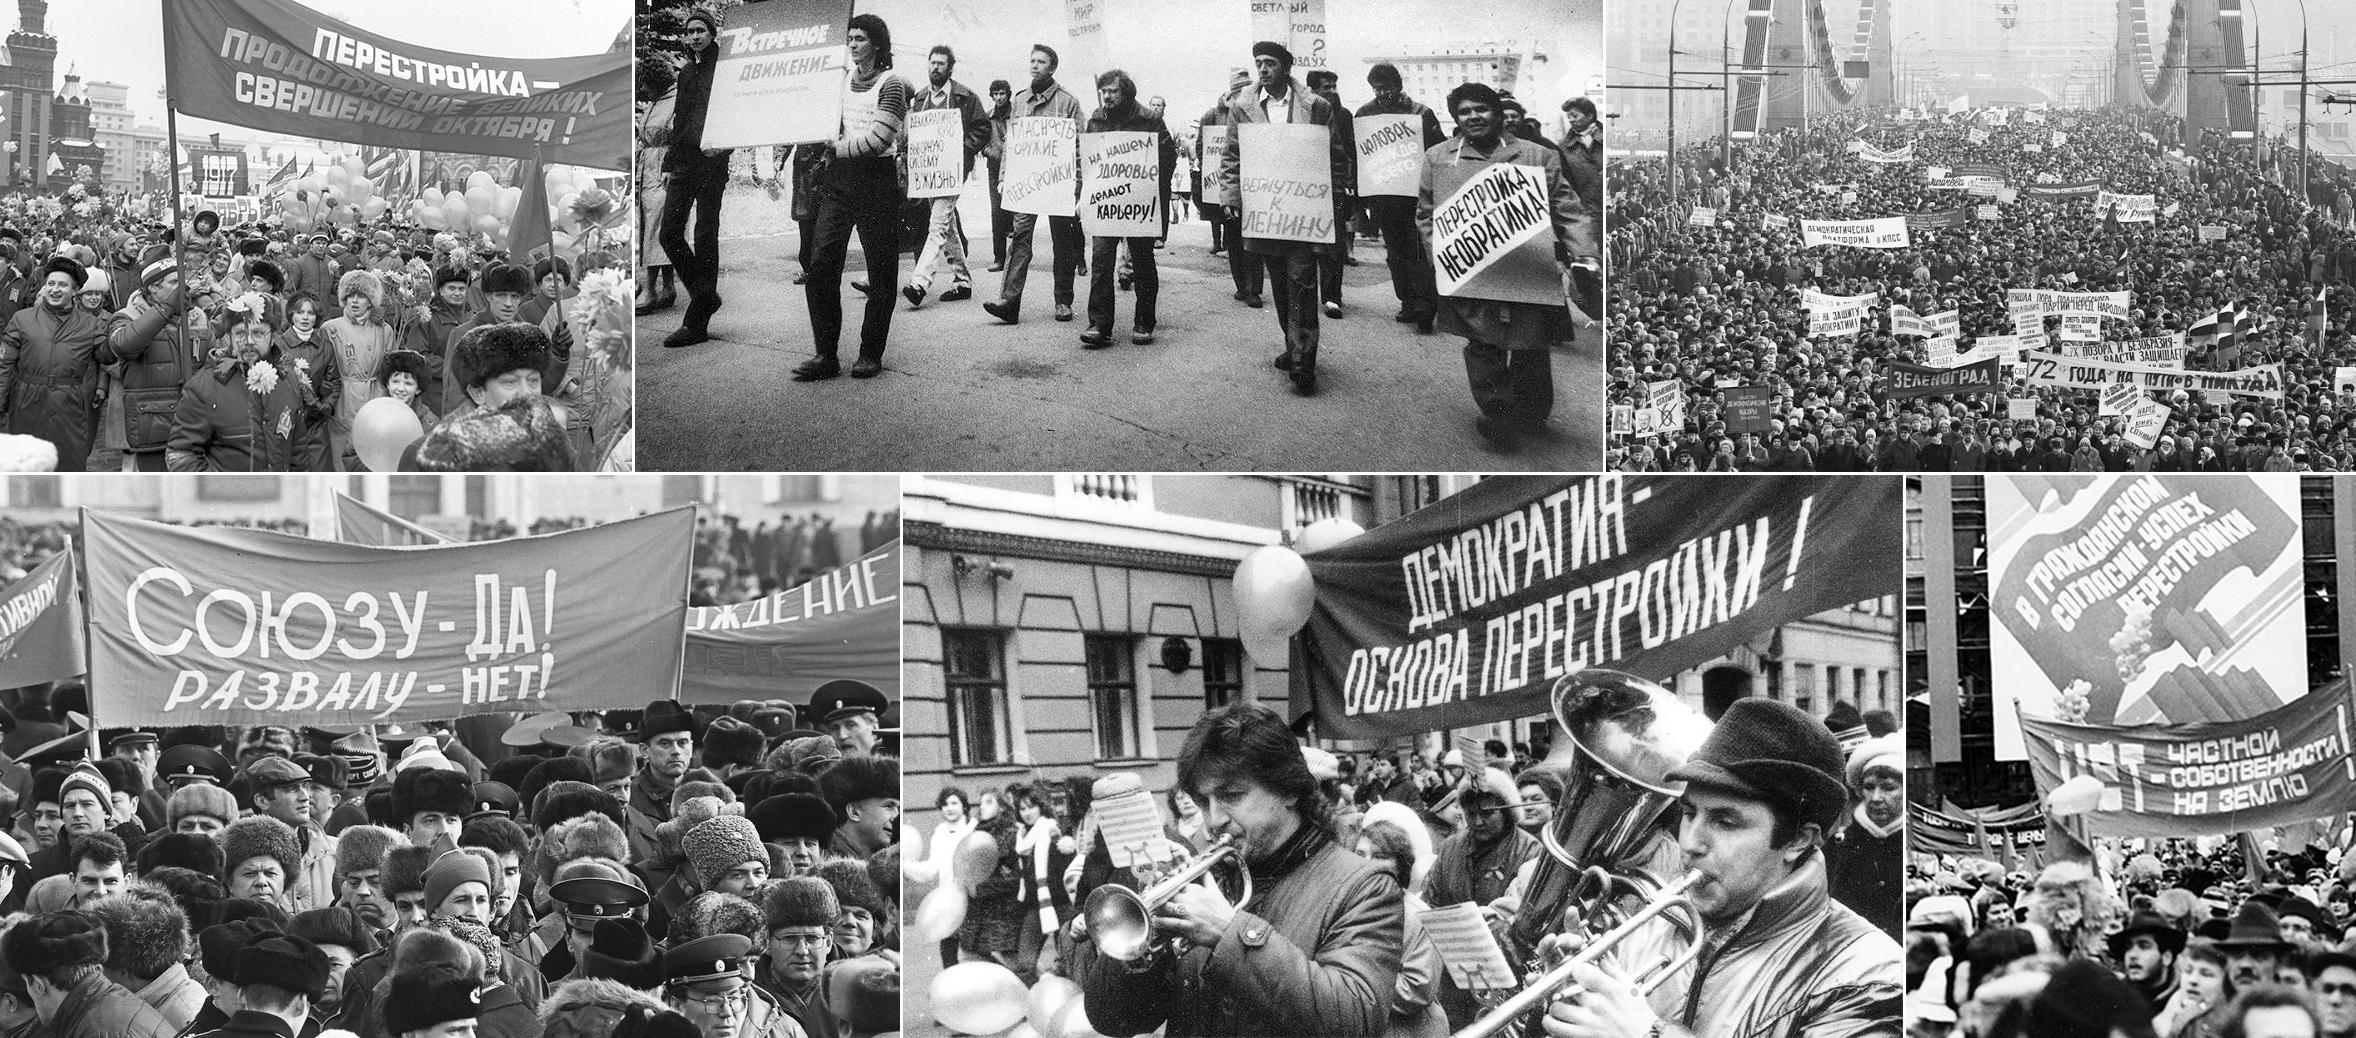 what impact did glasnost openness perestroika restructuring and demokratizatsiia democratization hav Mikhail gorbachev's perestroika and glasnost (restructuring of soviet (restructuring), glasnost (openness)  glasnost (oppeness), demokratizatsiia.